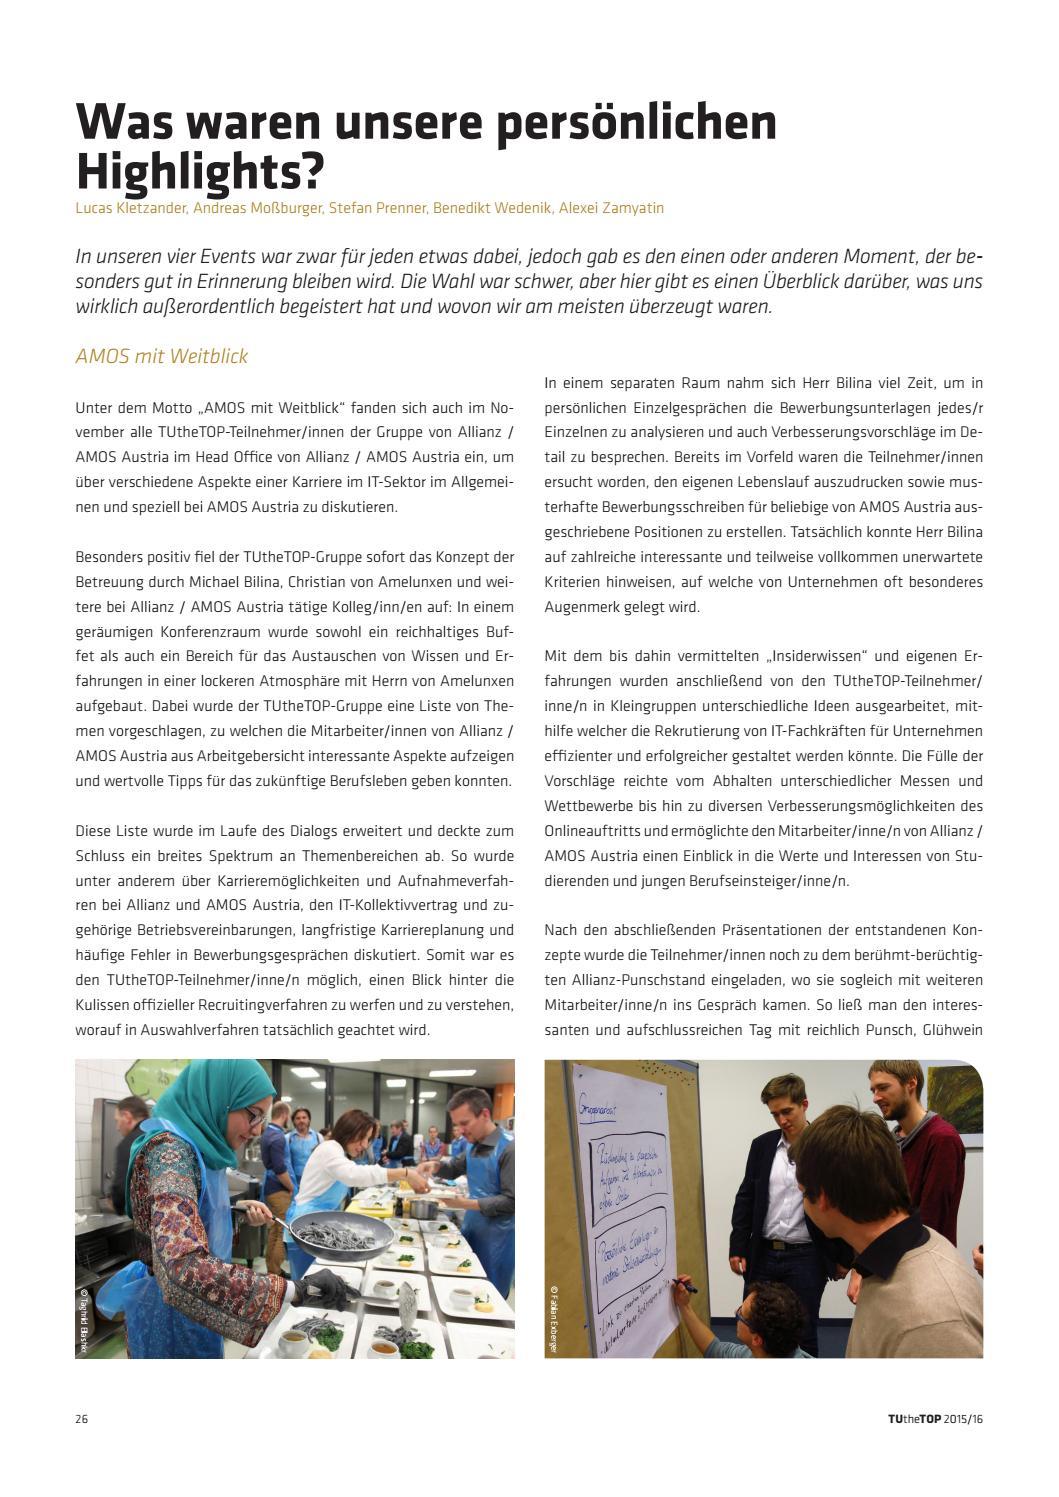 TUtheTOP Jahrgangsbericht 2015/16 by TU Career Center GmbH - issuu